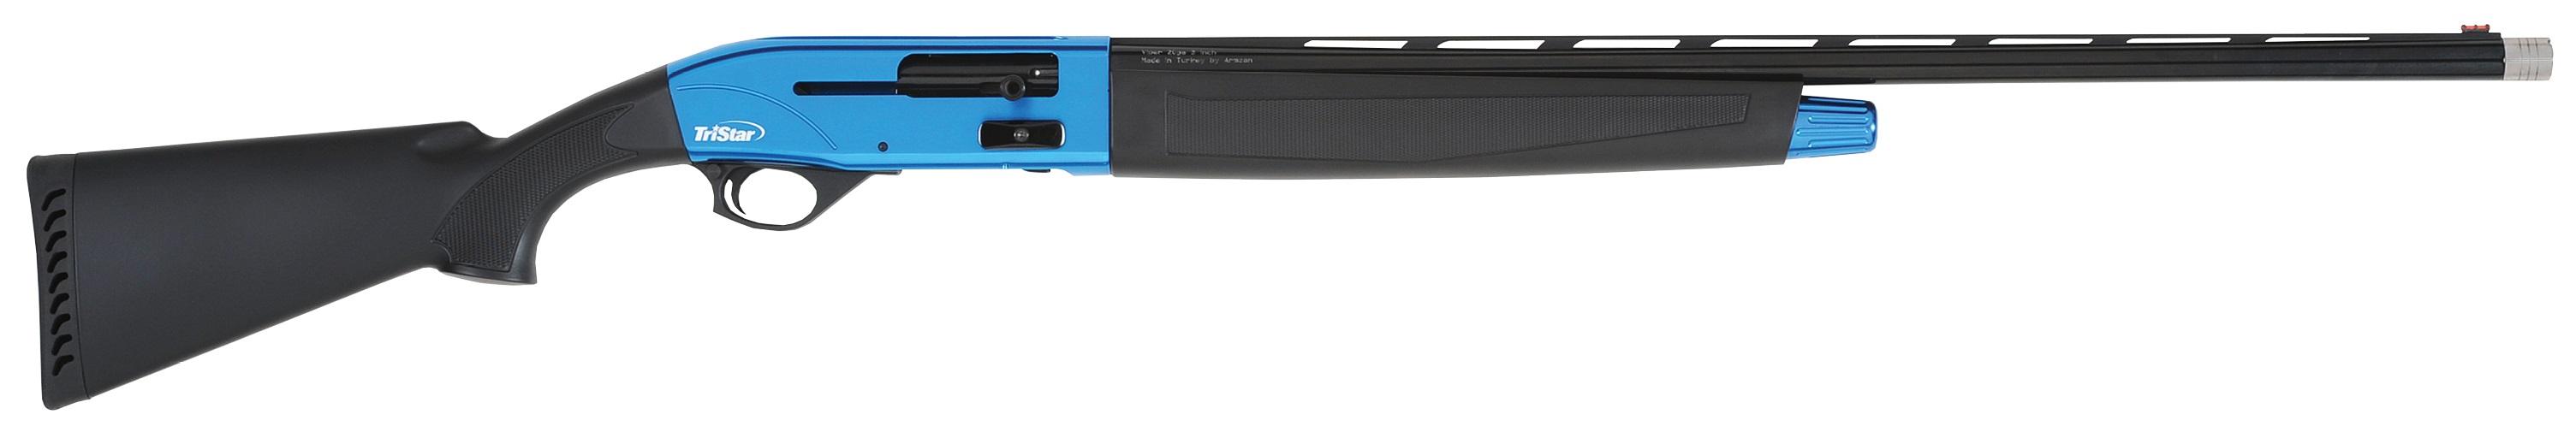 TriStar Sporting Arms Viper G2 SR Sport 20 Gauge